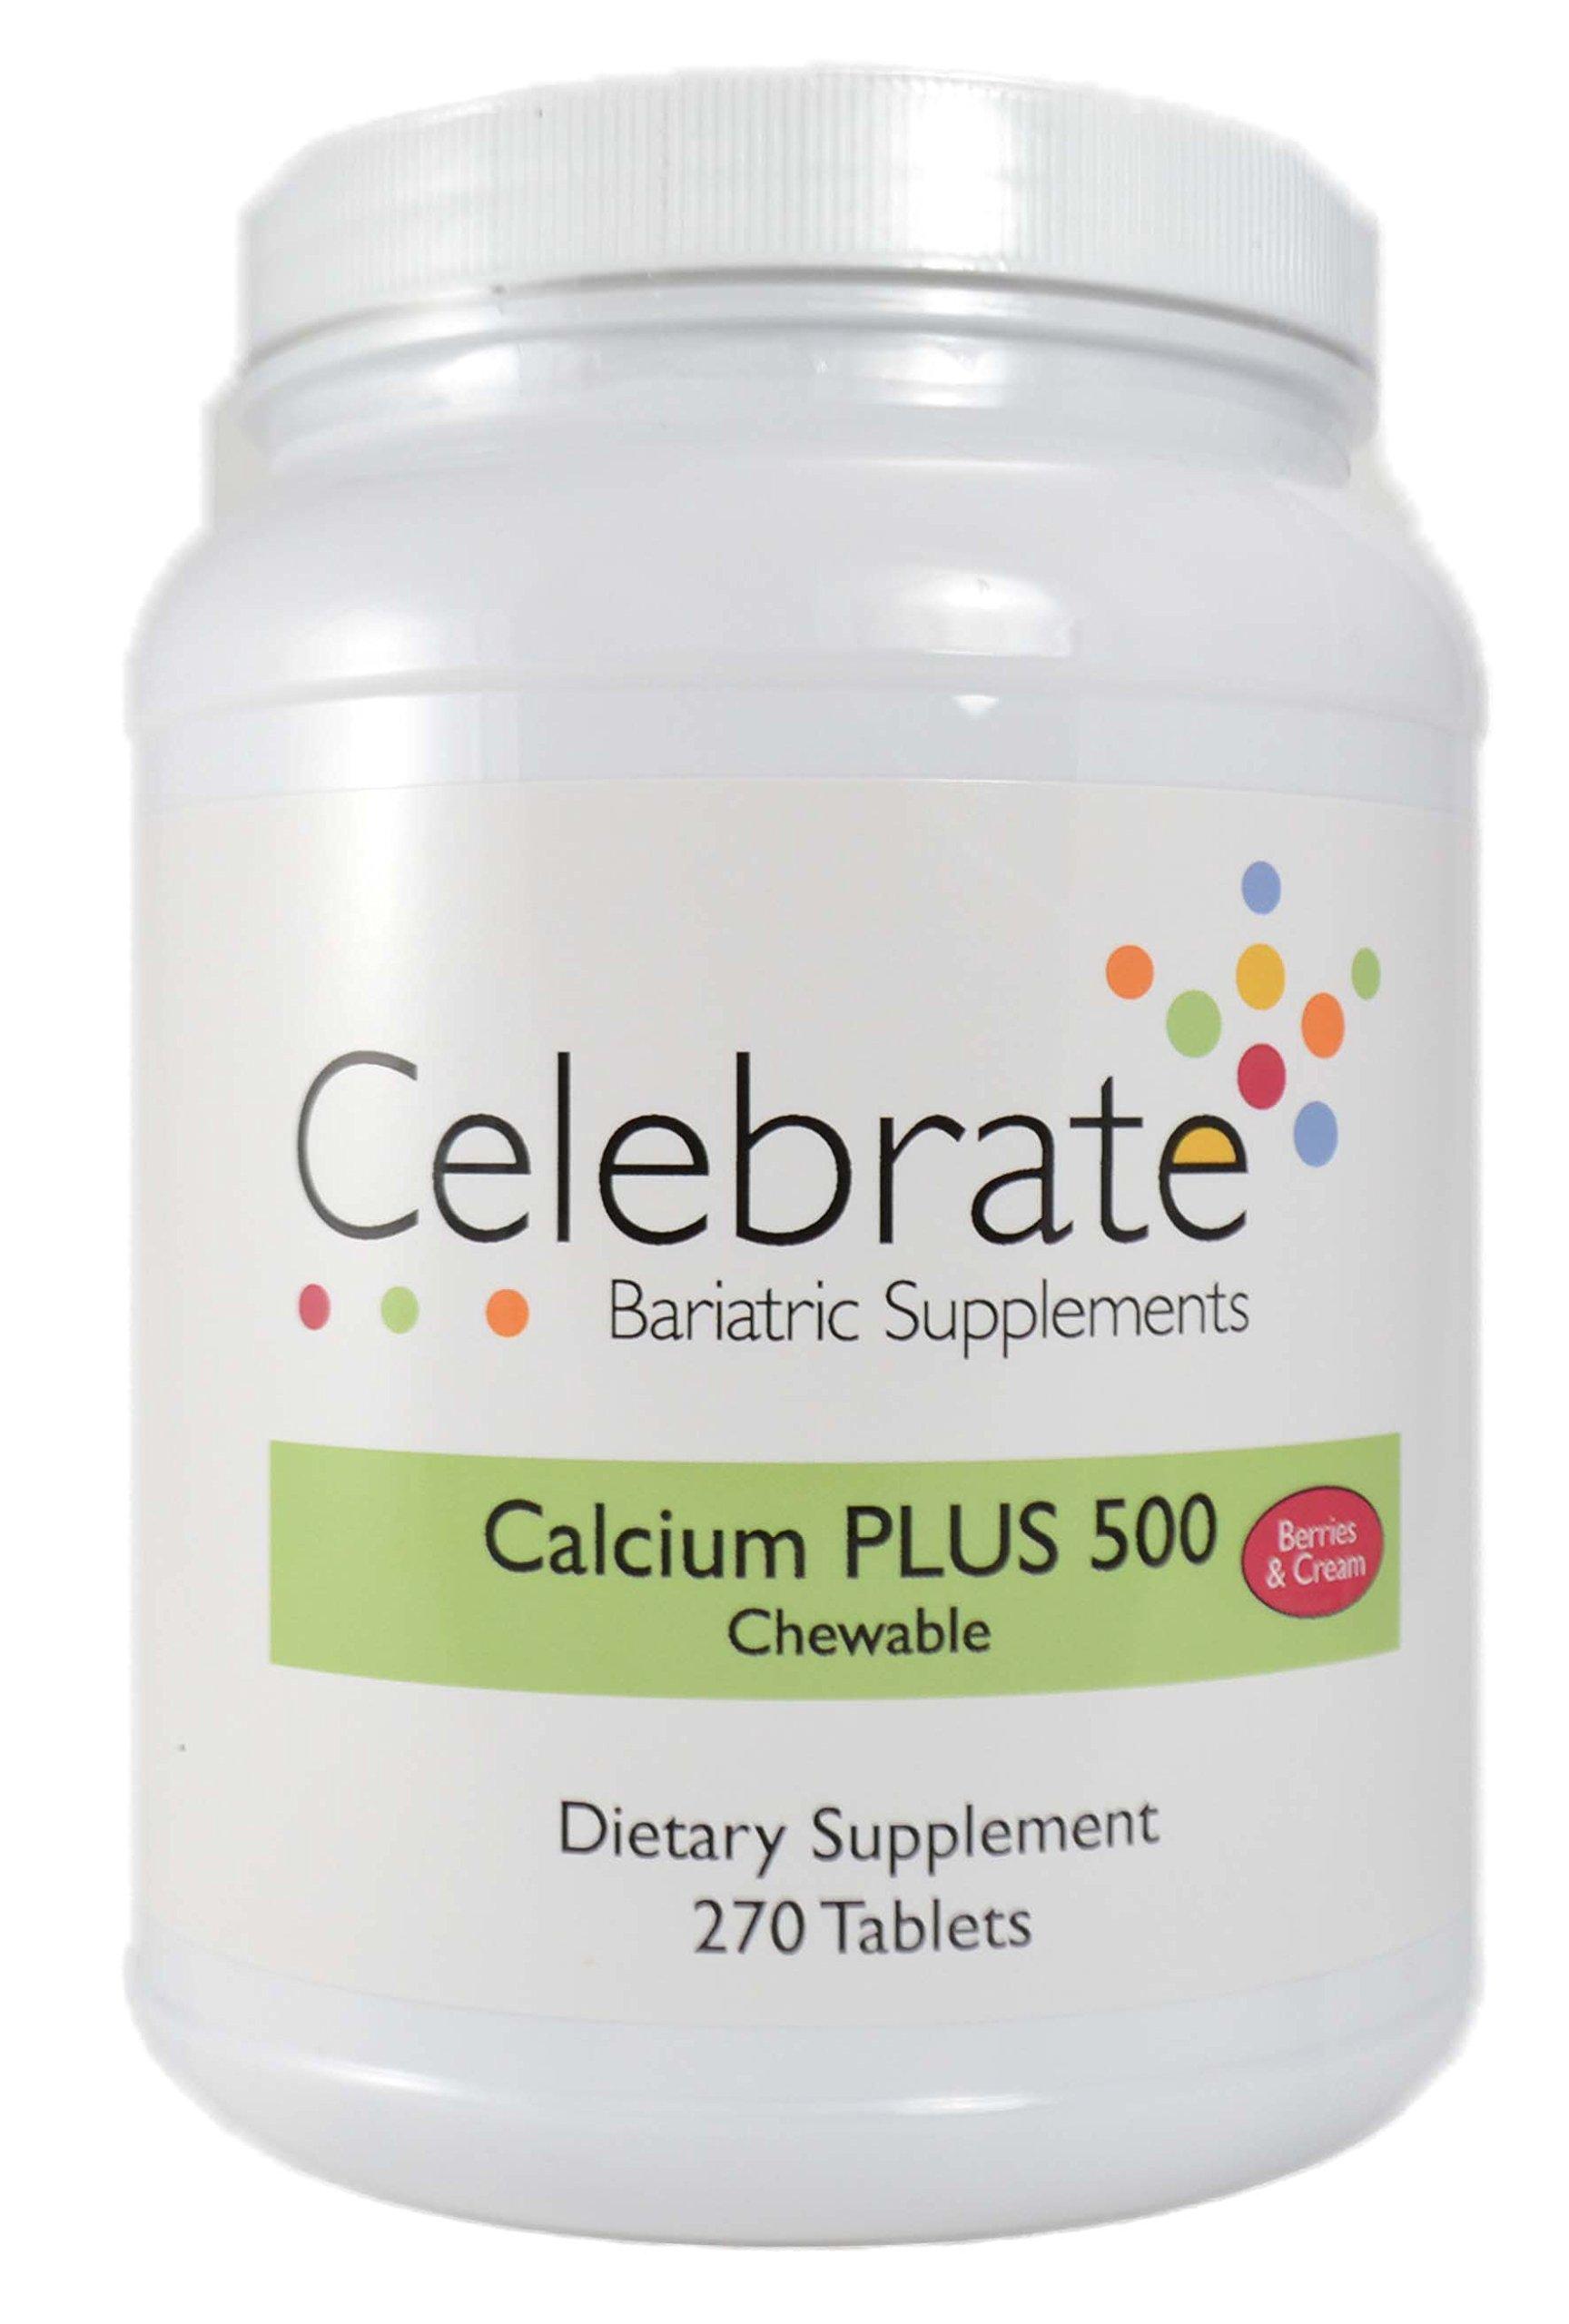 Celebrate Calcium Citrate Plus 500mg Chewable Berries & Cream 270 Count by Celebrate Vitamins